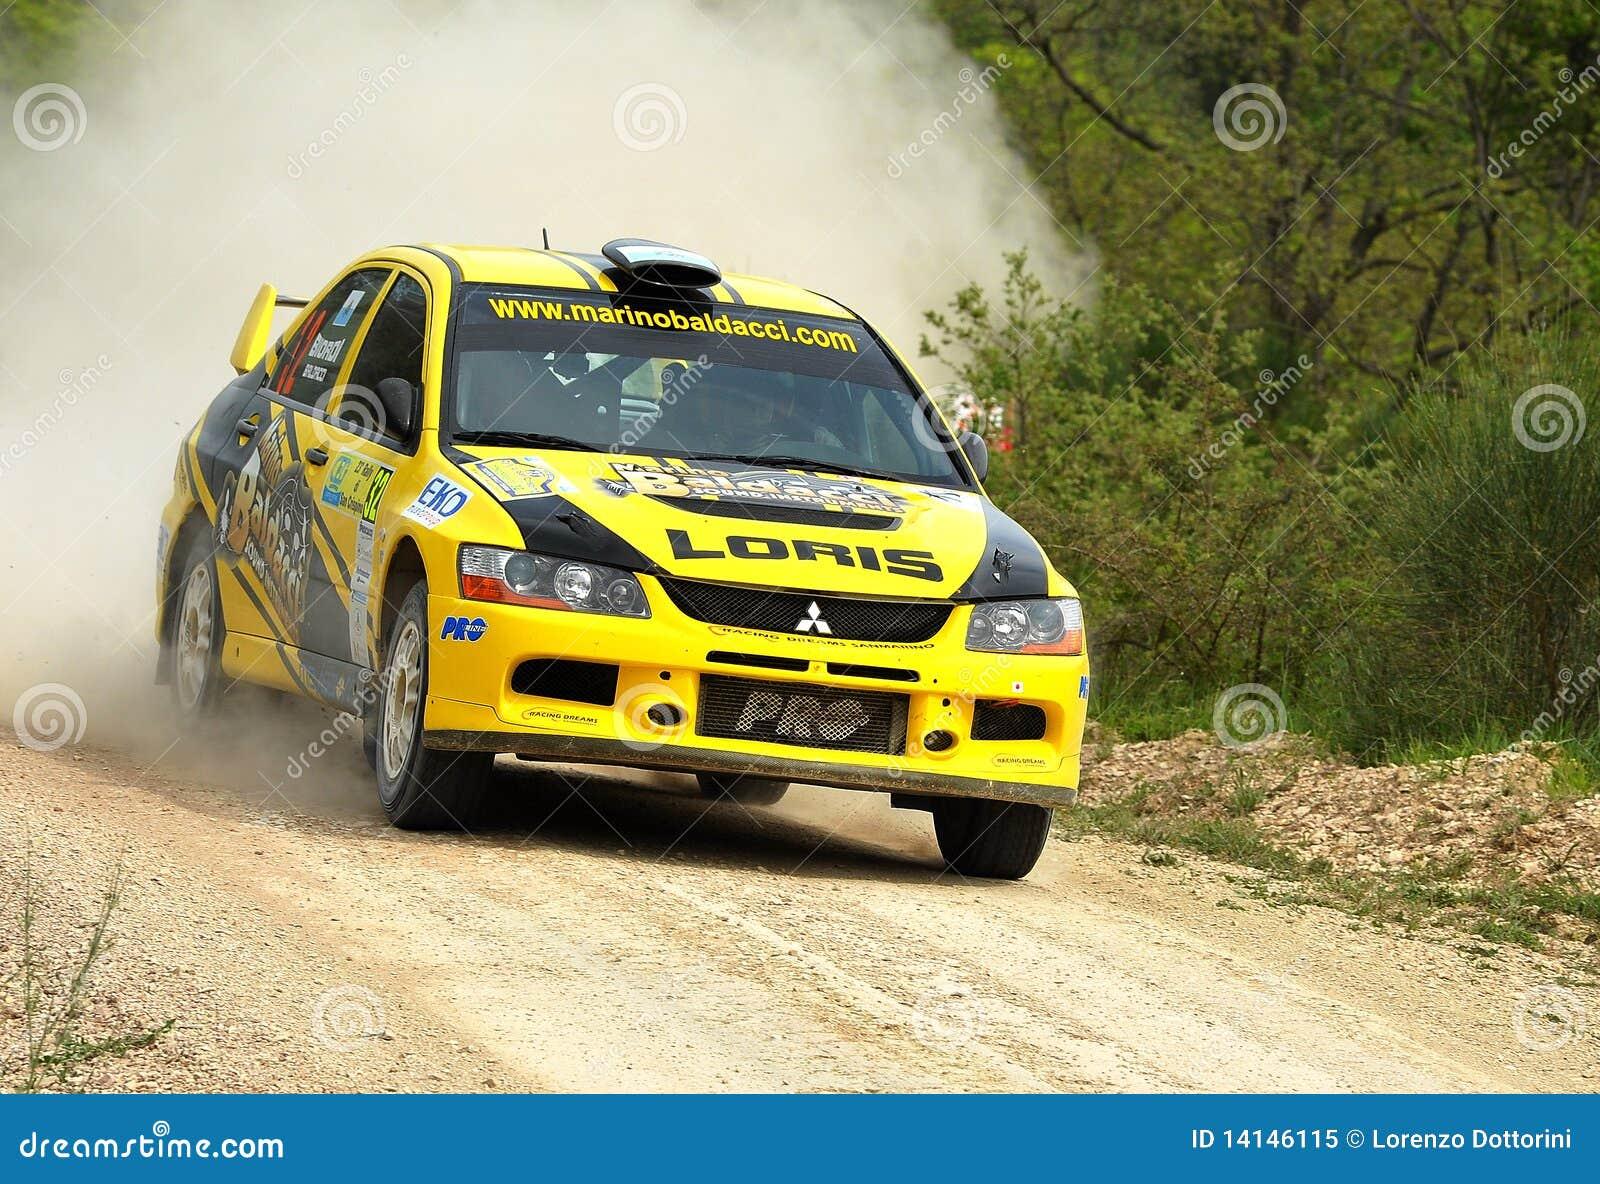 Mitsubishi Lancer Evo IX Rally Car Editorial Image - Image of ...